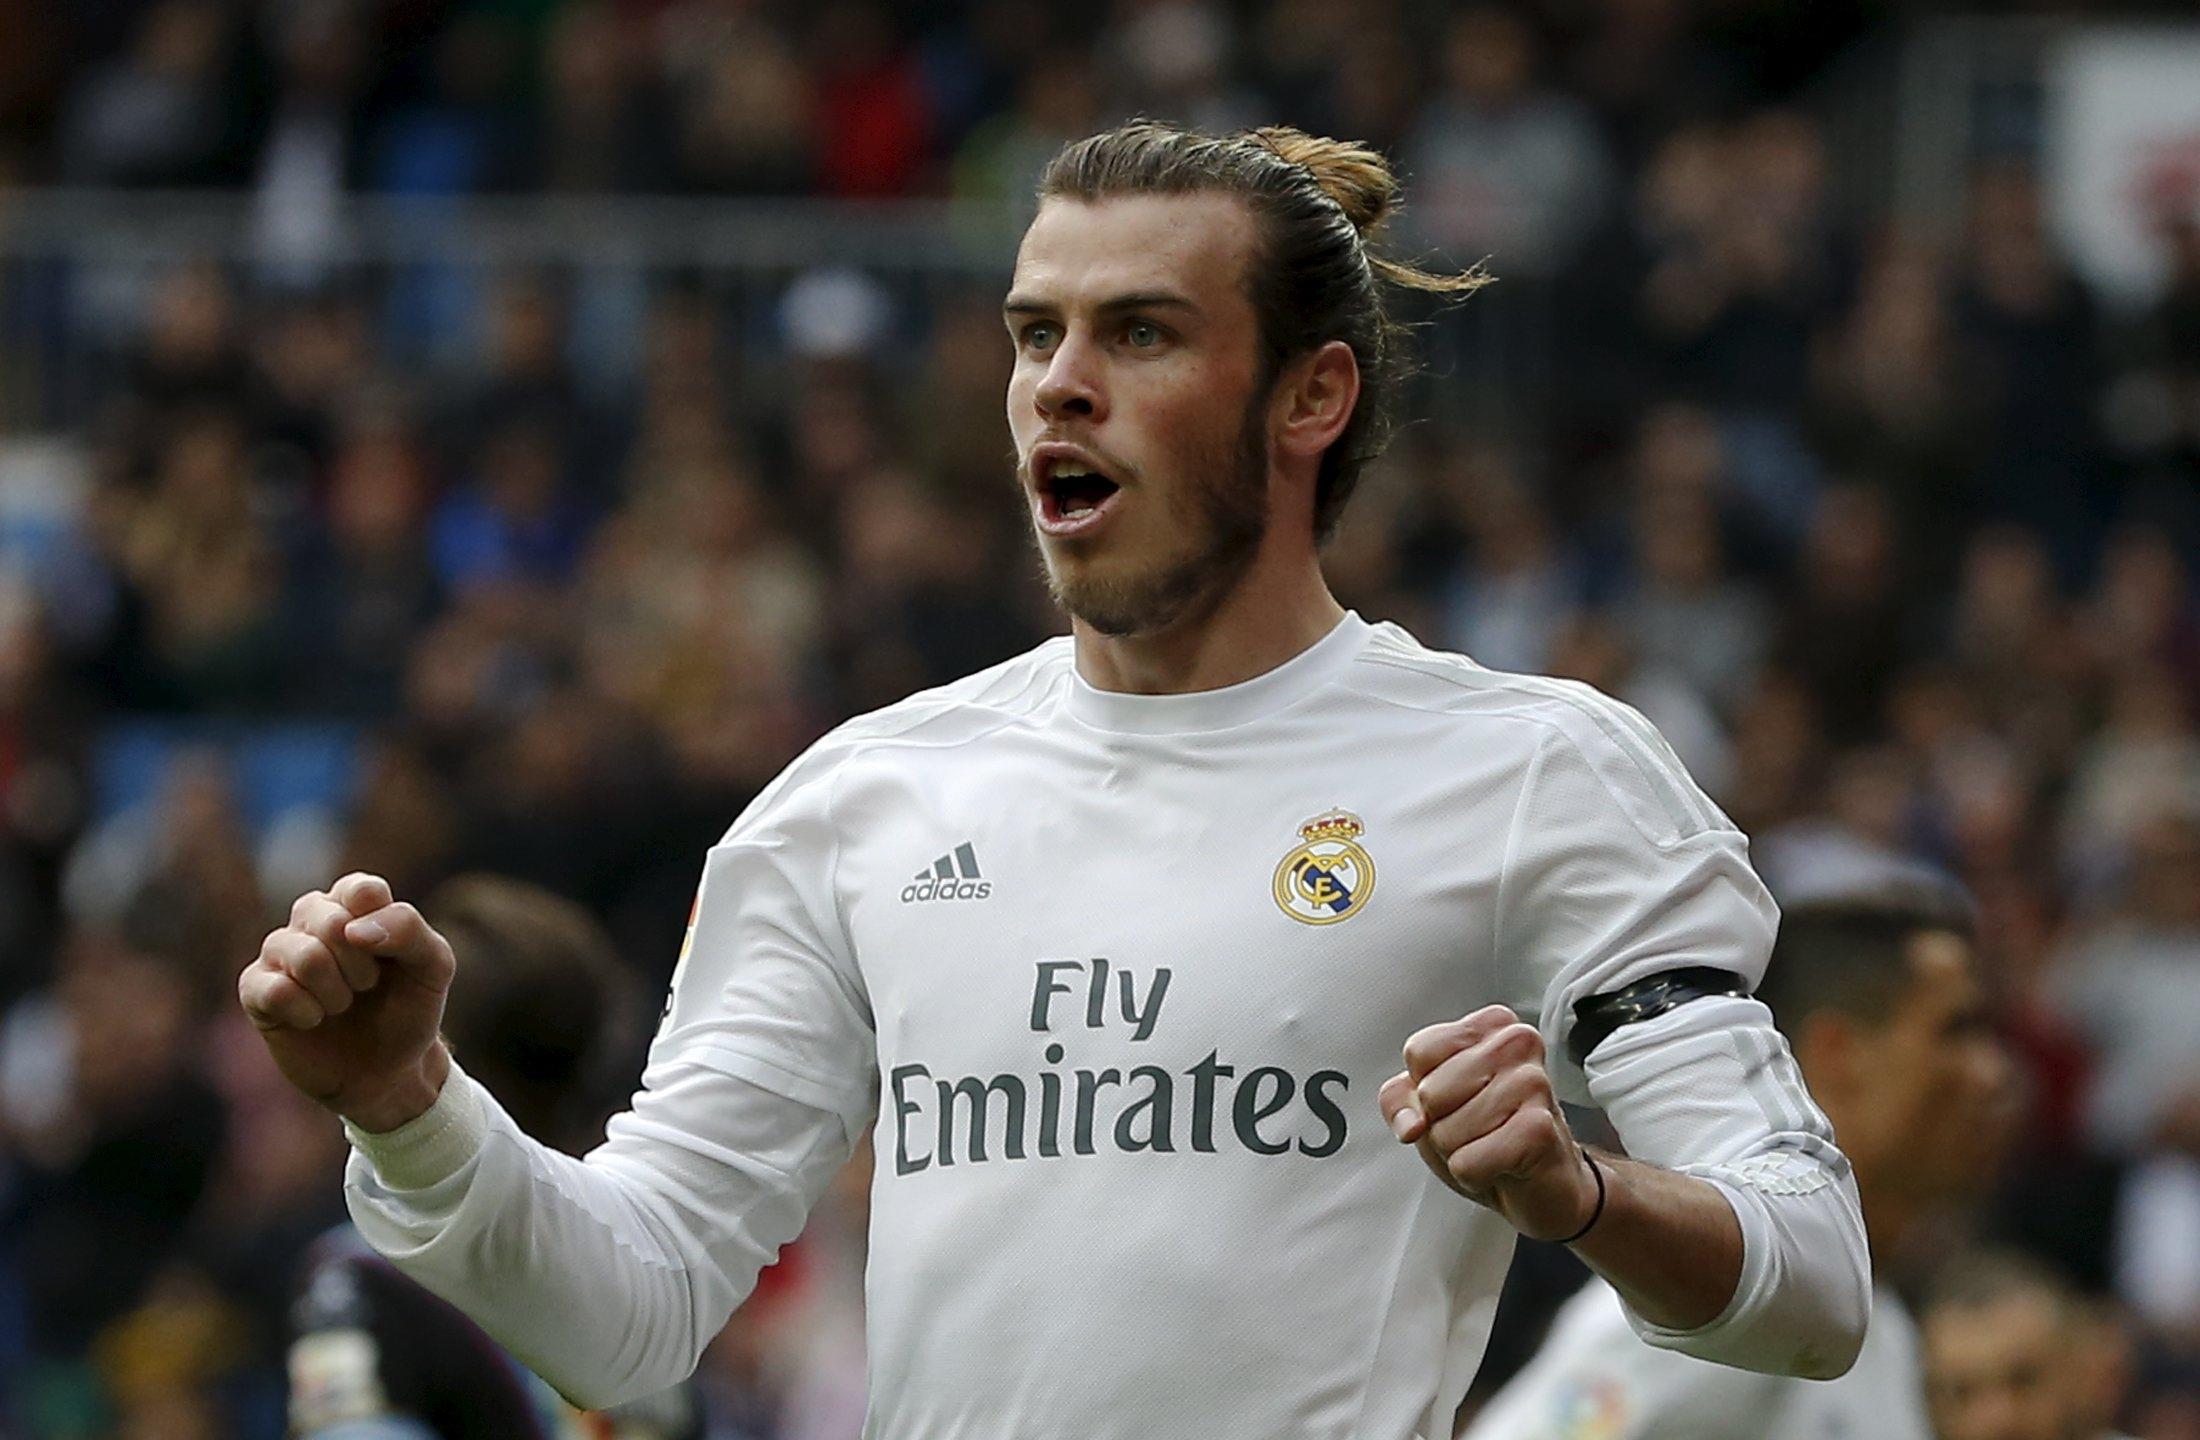 Real Madrid's Gareth Bale celebrates his team's second goal during La Liga ta Santiago Bernabeau Stadium on Sunday, December 20, 2015. Photo: Reuters